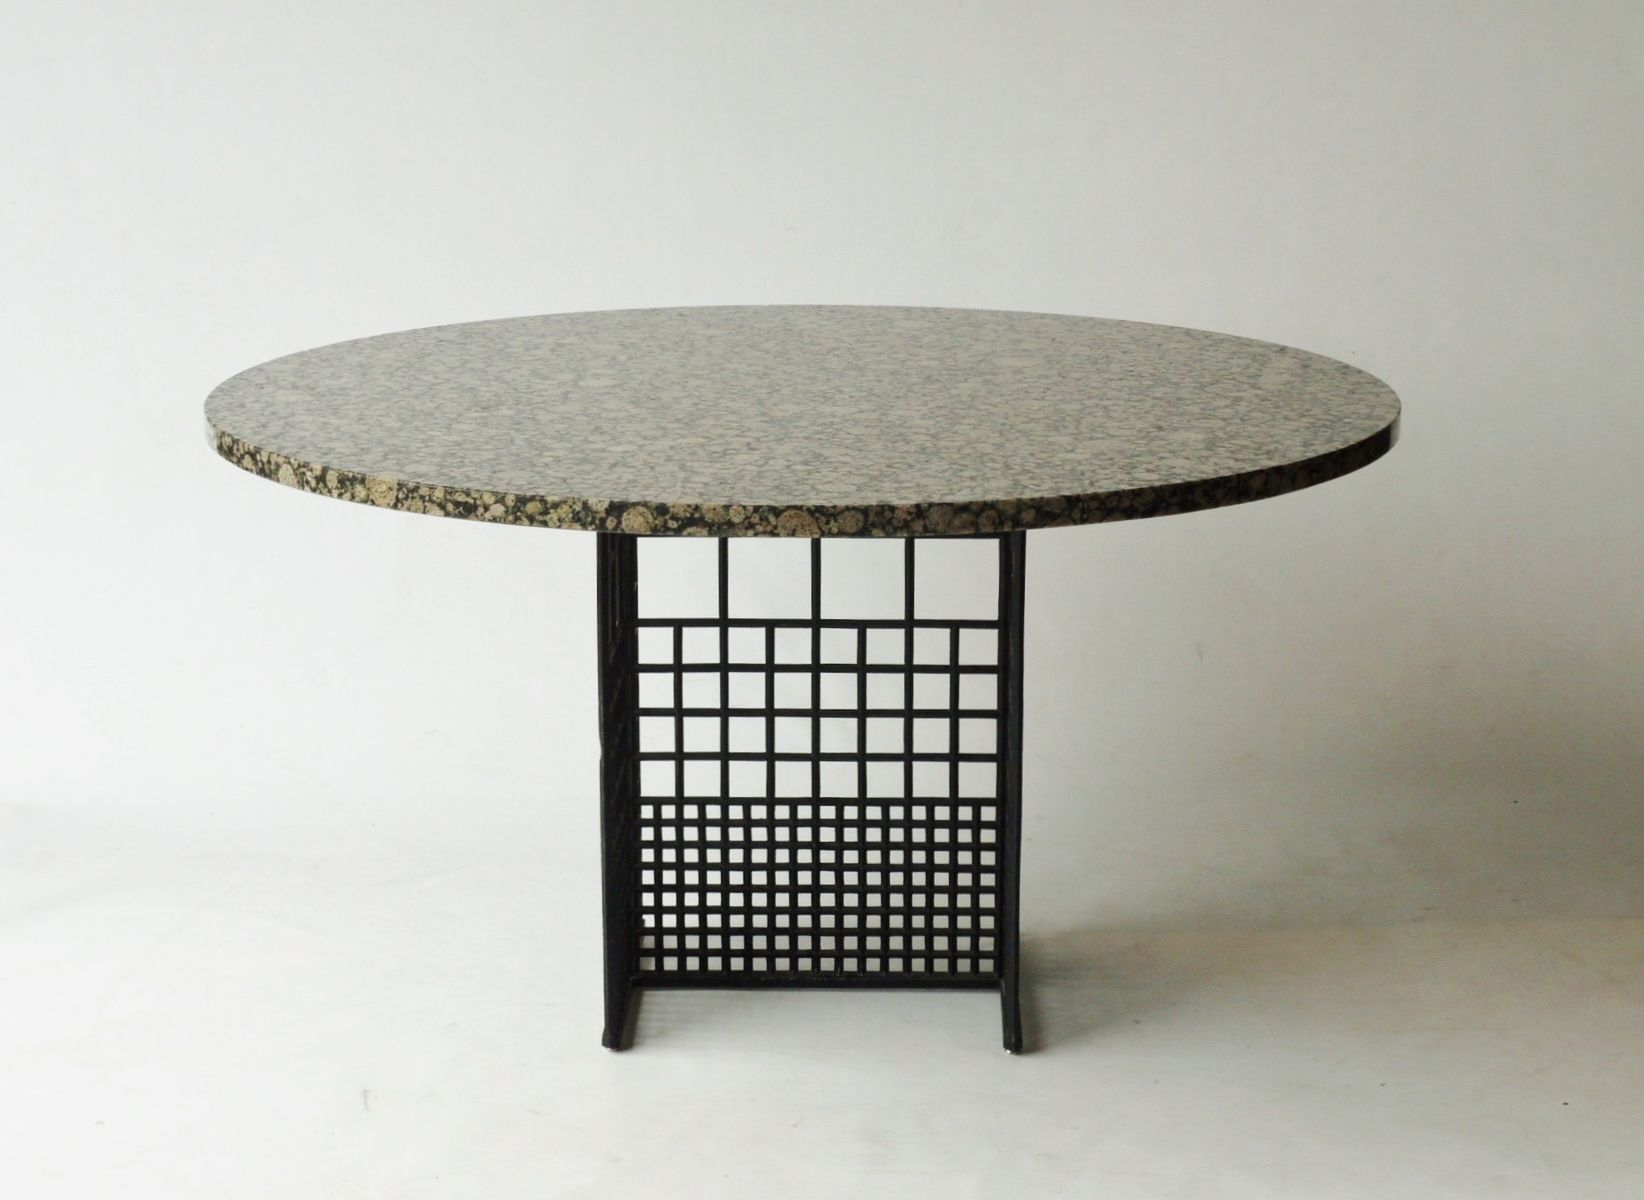 vintage dining table with granite top 1980s for sale at. Black Bedroom Furniture Sets. Home Design Ideas